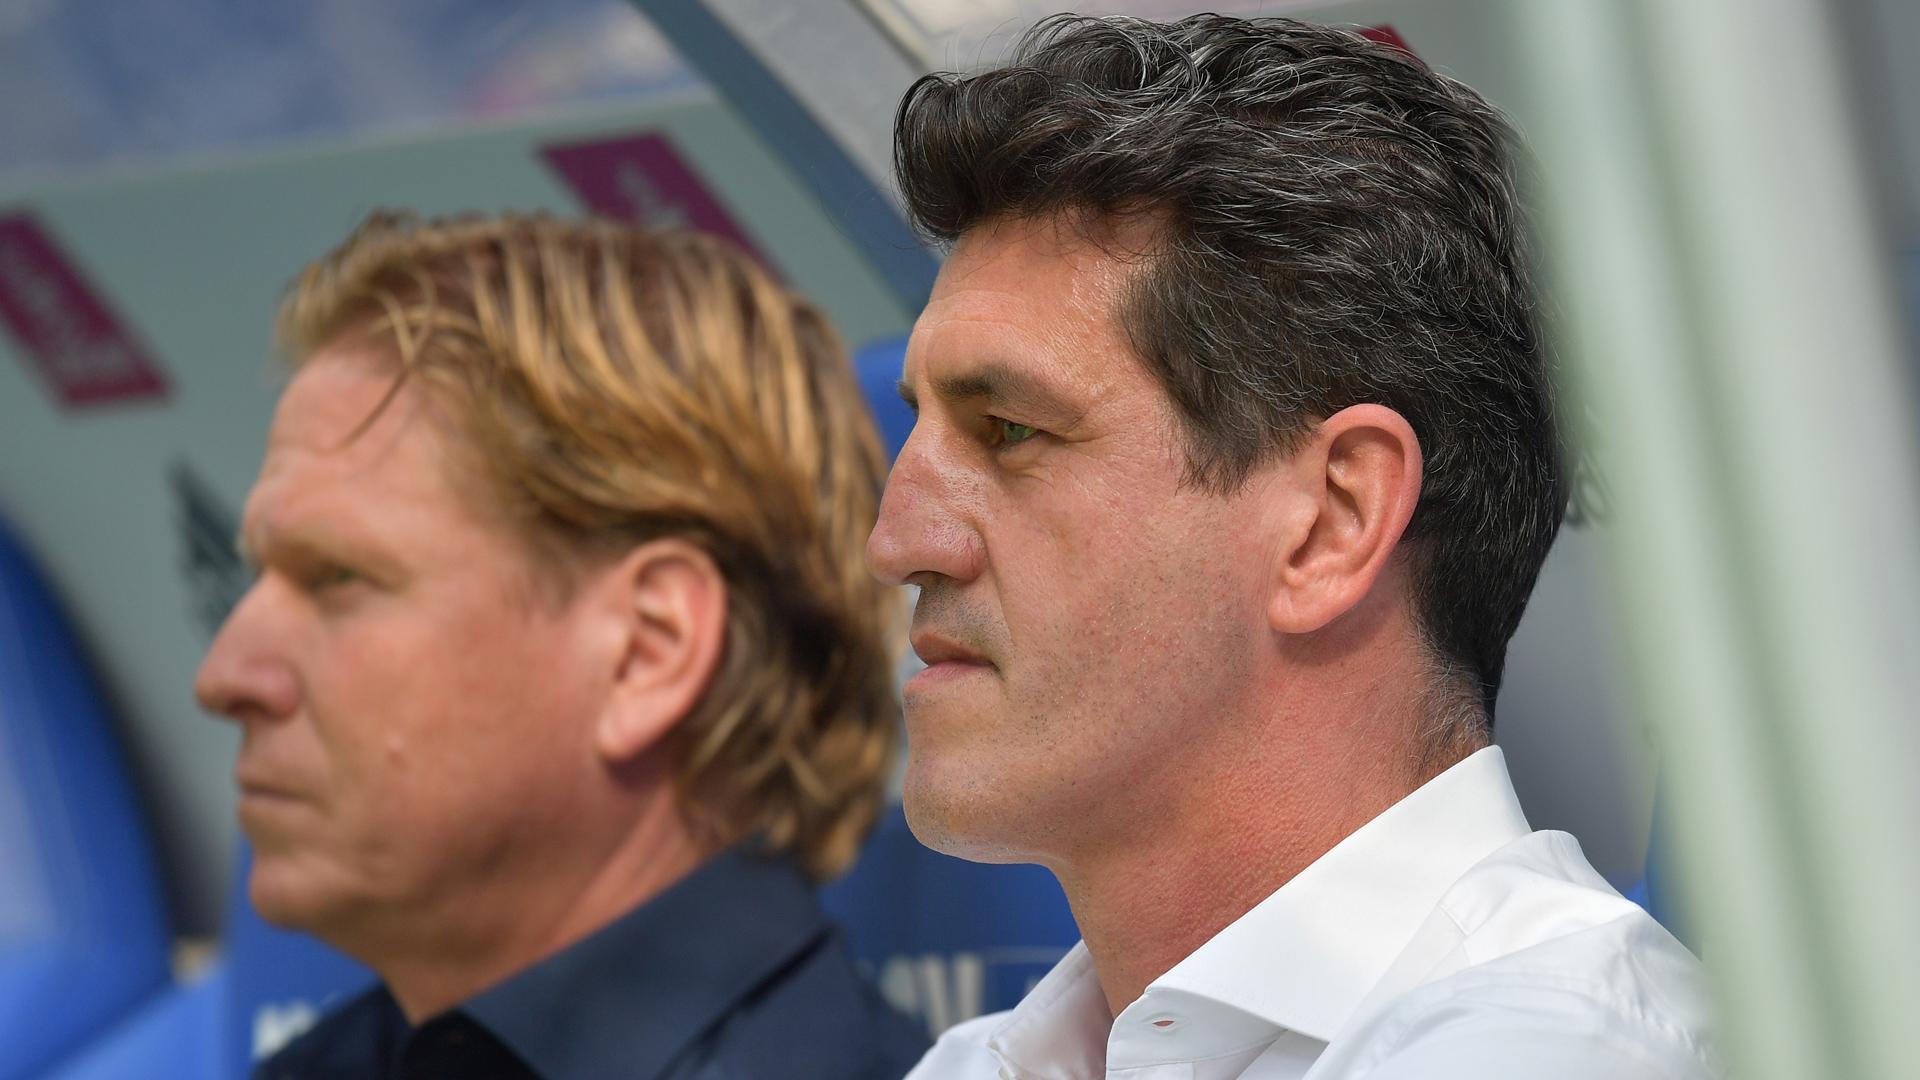 HSV erstmals mit 17-jährigem Arp zu Beginn gegen Stuttgart